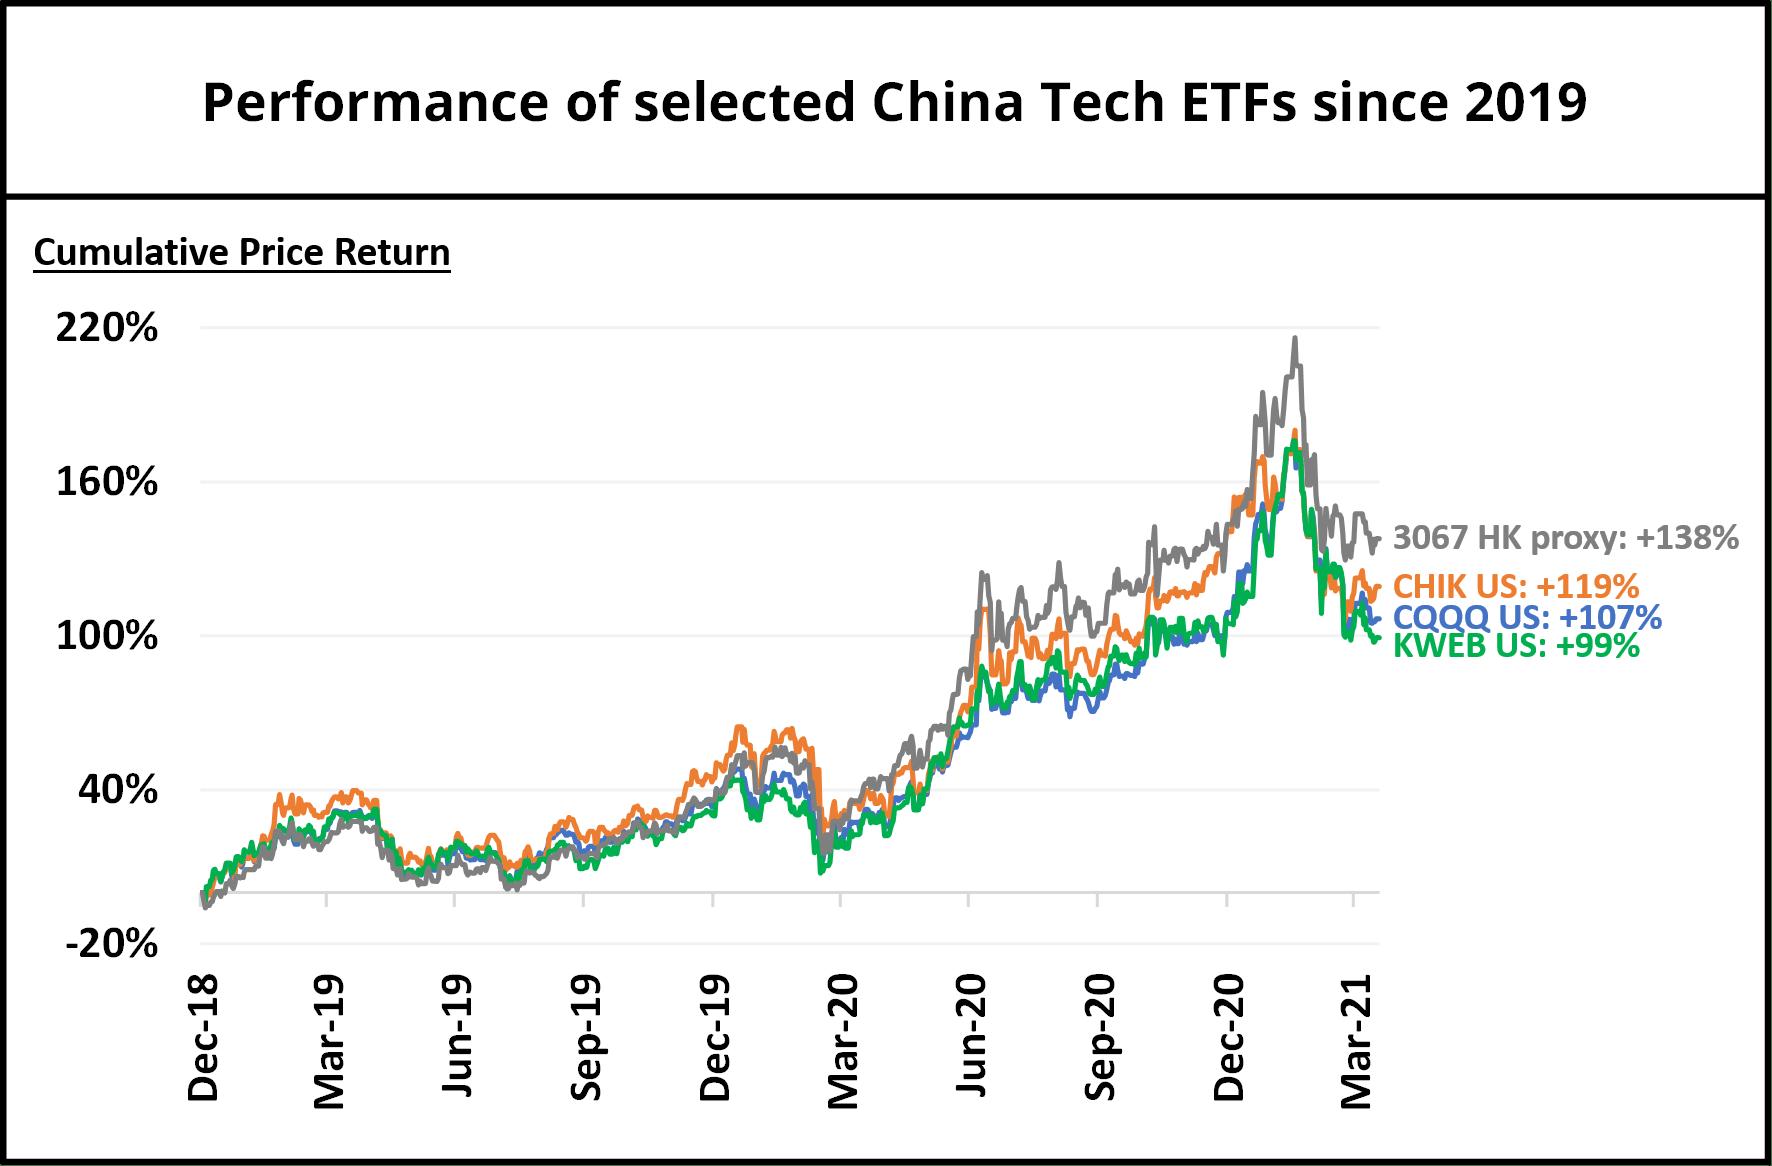 srcset=https://i1.wp.com/theinvestquest.com/wp-content/uploads/Cumulative-return-of-ETFs-since-2019.png?w=1772&ssl=1